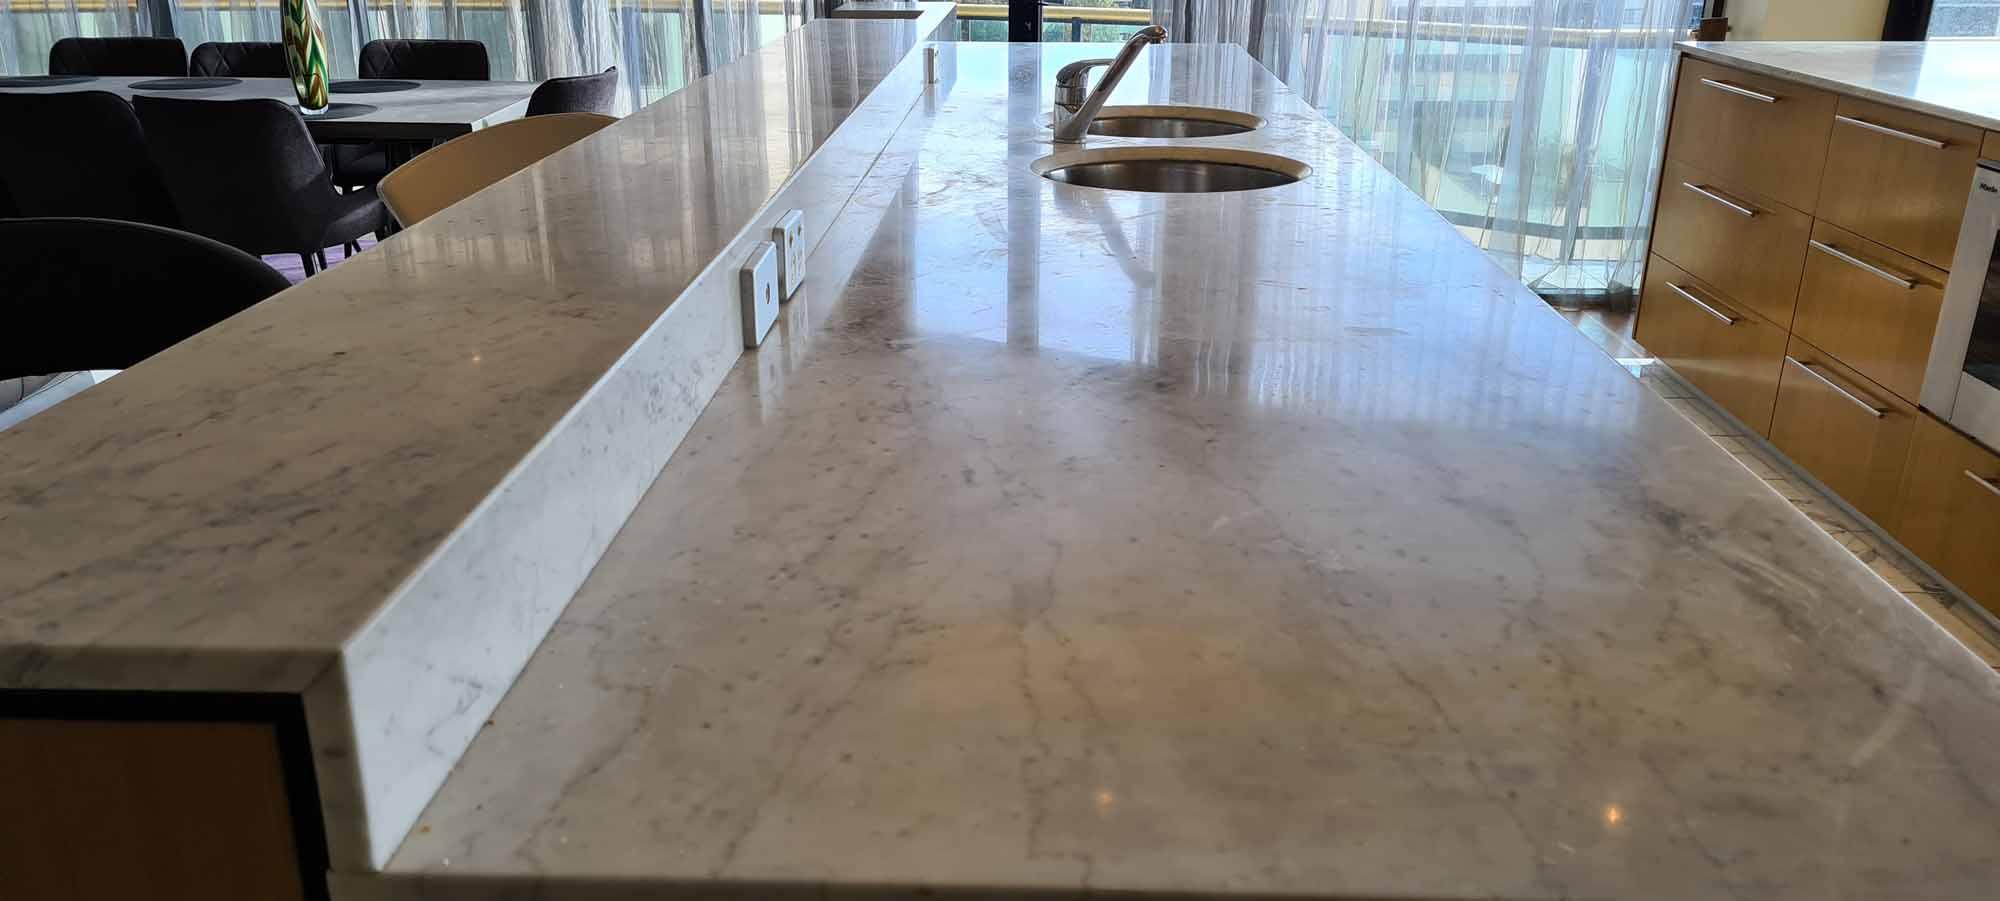 Marble Restoration, Grinding, Honing, Polishing & Sealing in Perth WA